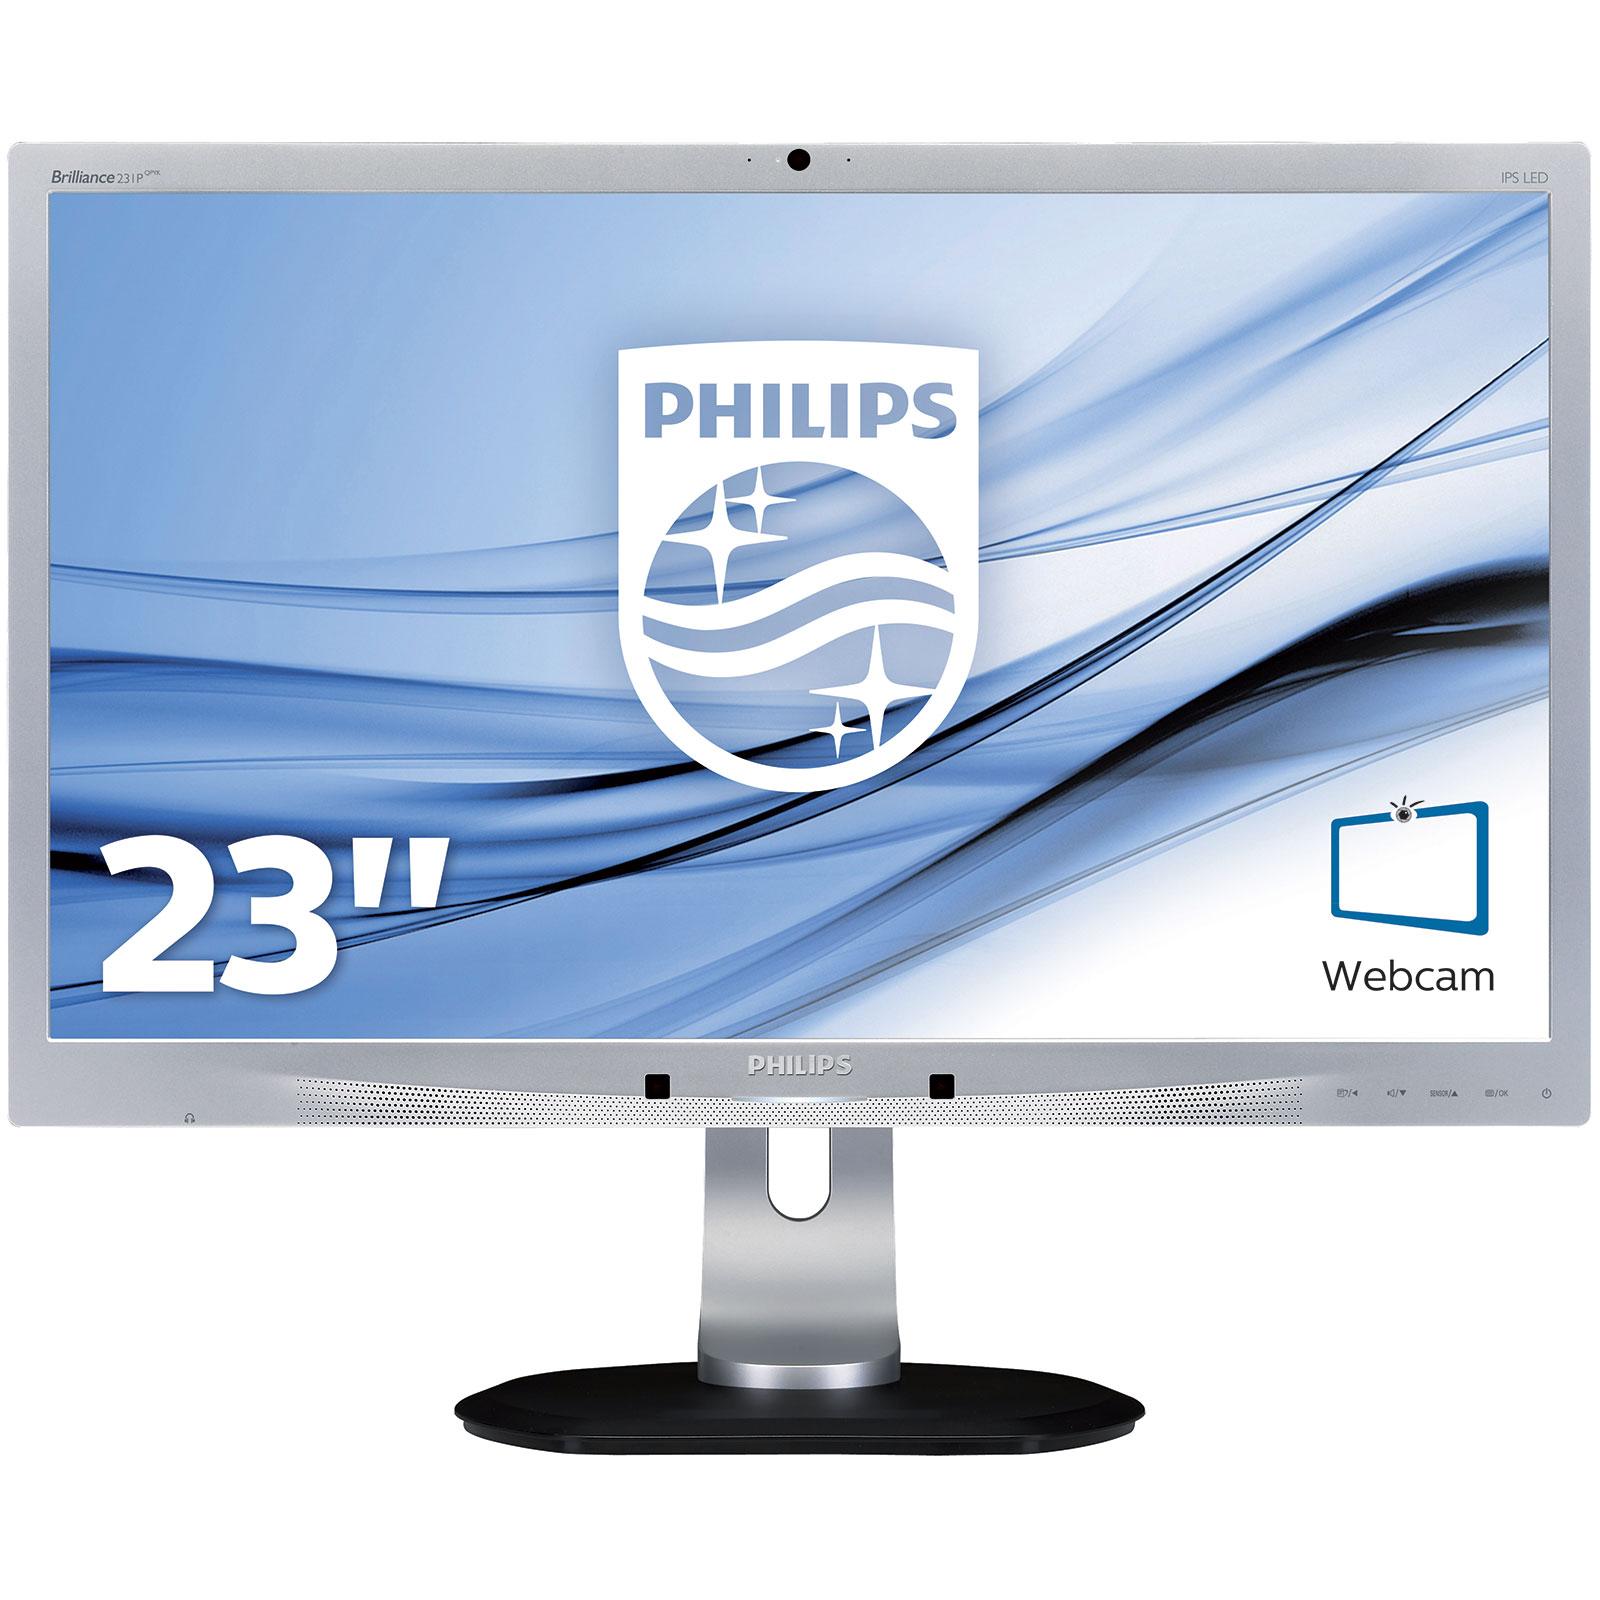 "Ecran PC Philips 23"" LED - 231P4QPYKES 1920 x 1080 pixels - 7 ms - Format large 16/9 - Full HD - Dalle IPS - DisplayPort - Hub USB - Webcam - Argent"